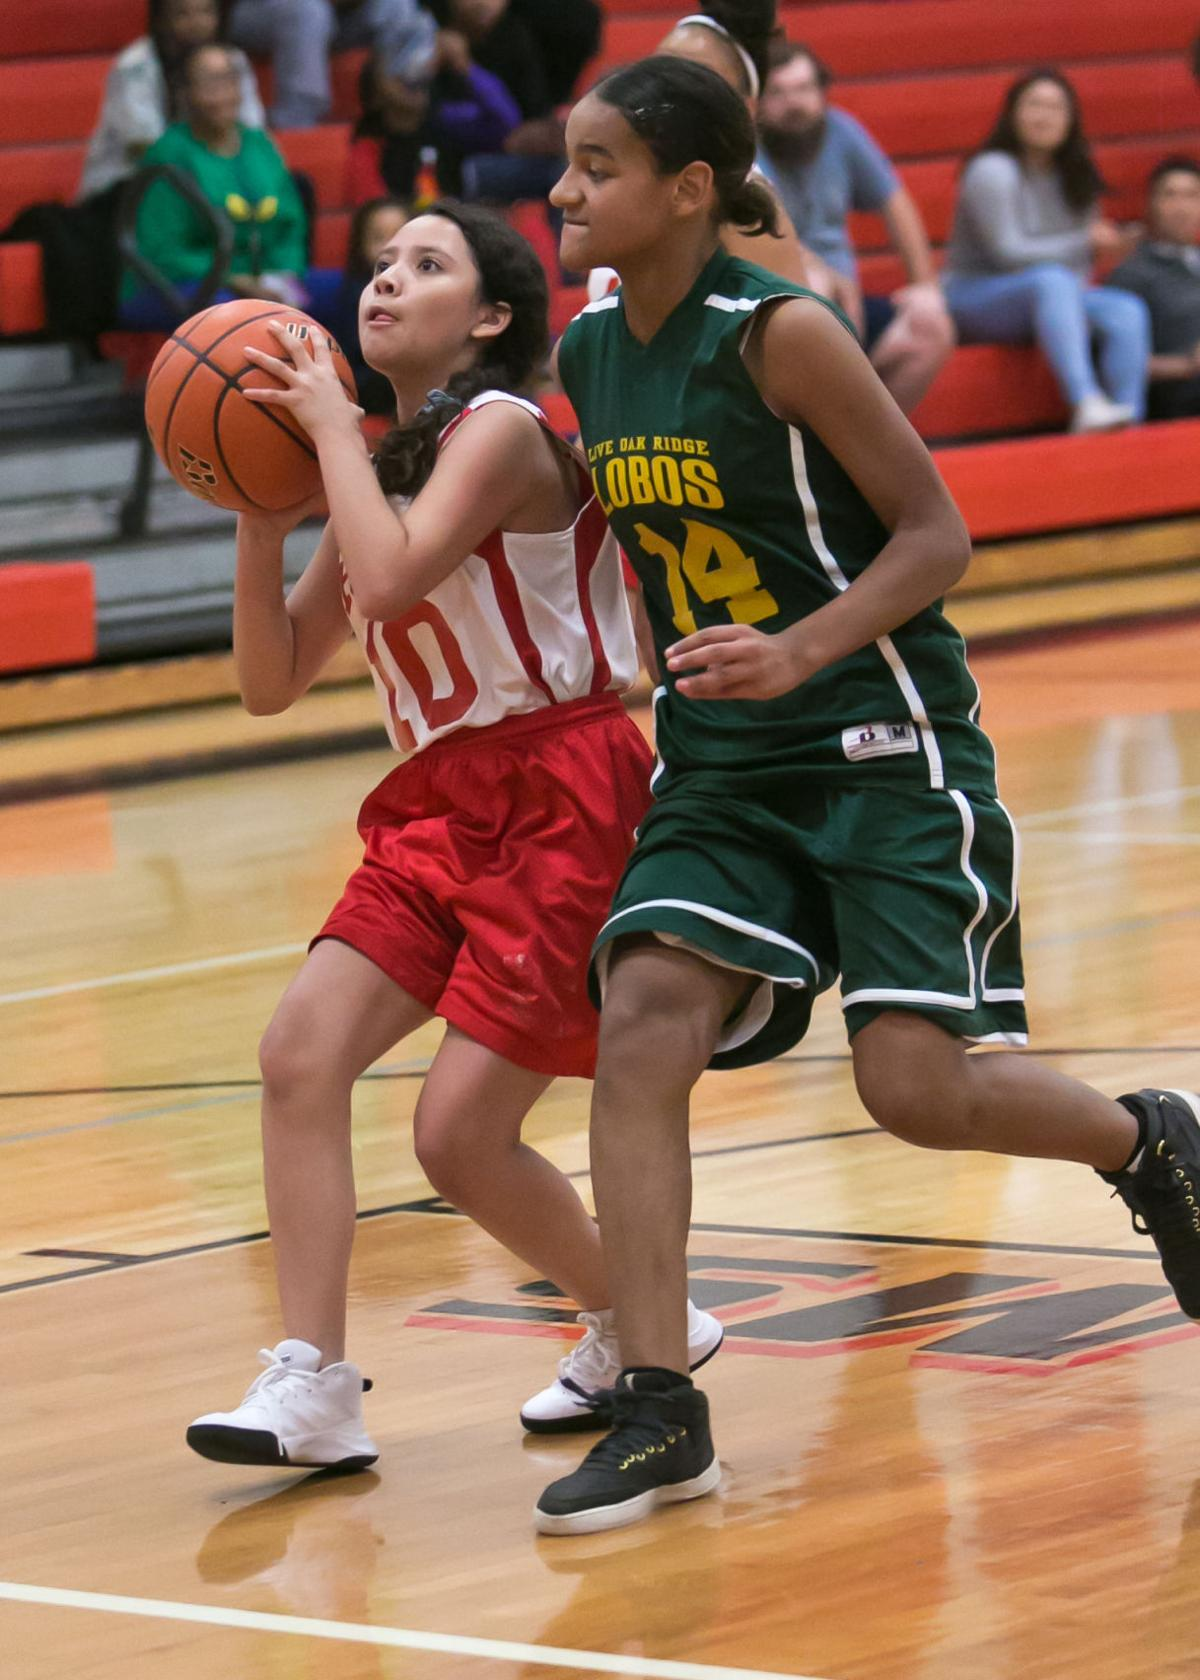 Live Oak Ridge vs. Manor Girls Middle school basketball